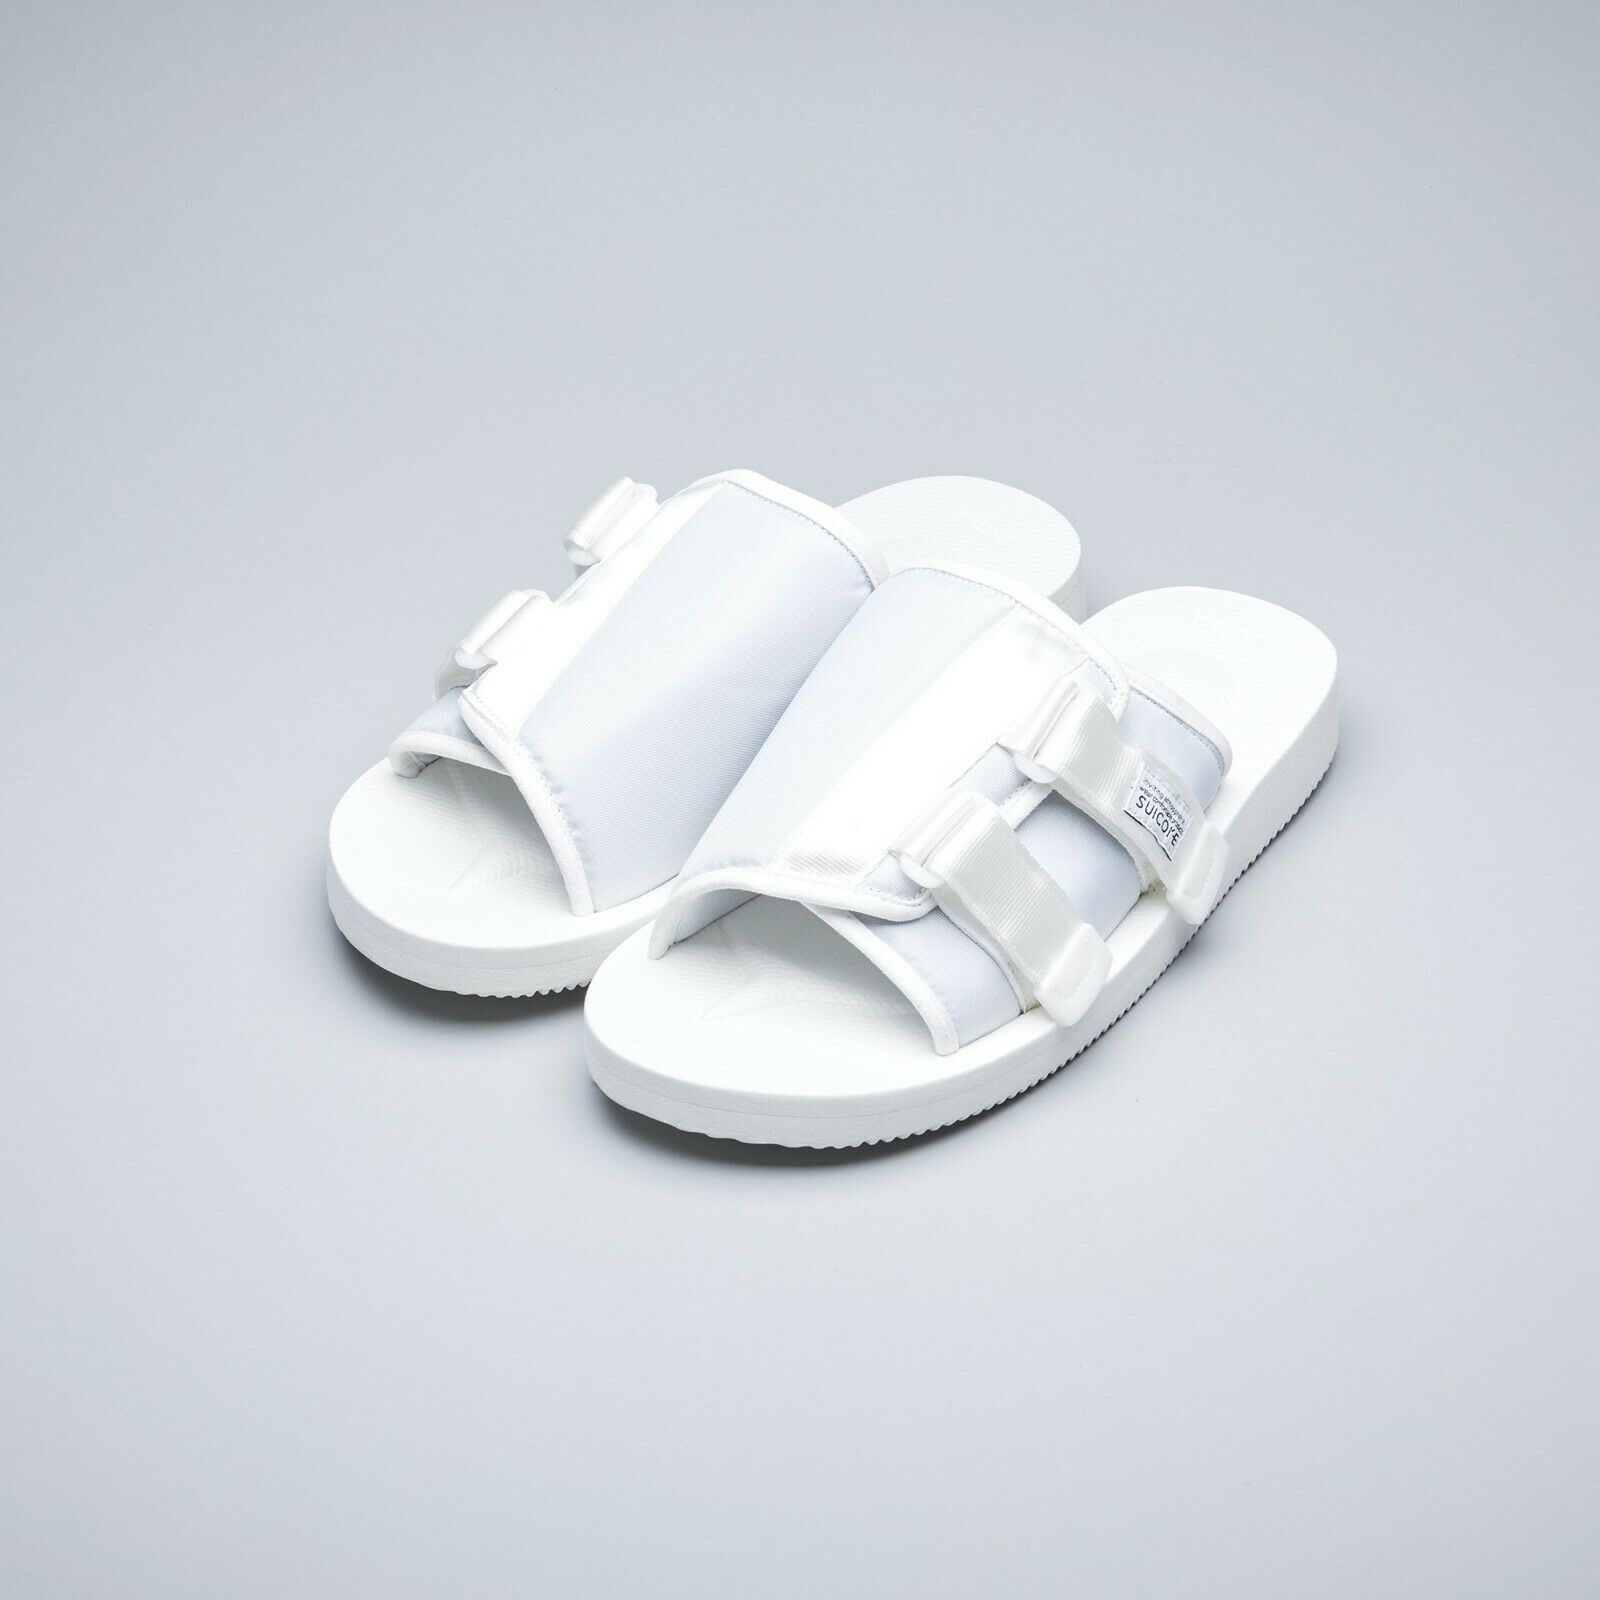 bfb1e5f7770 Suicoke SS19 OG-081Cab / KAW-Cab White Nylon Antibacterial Sandals Slides